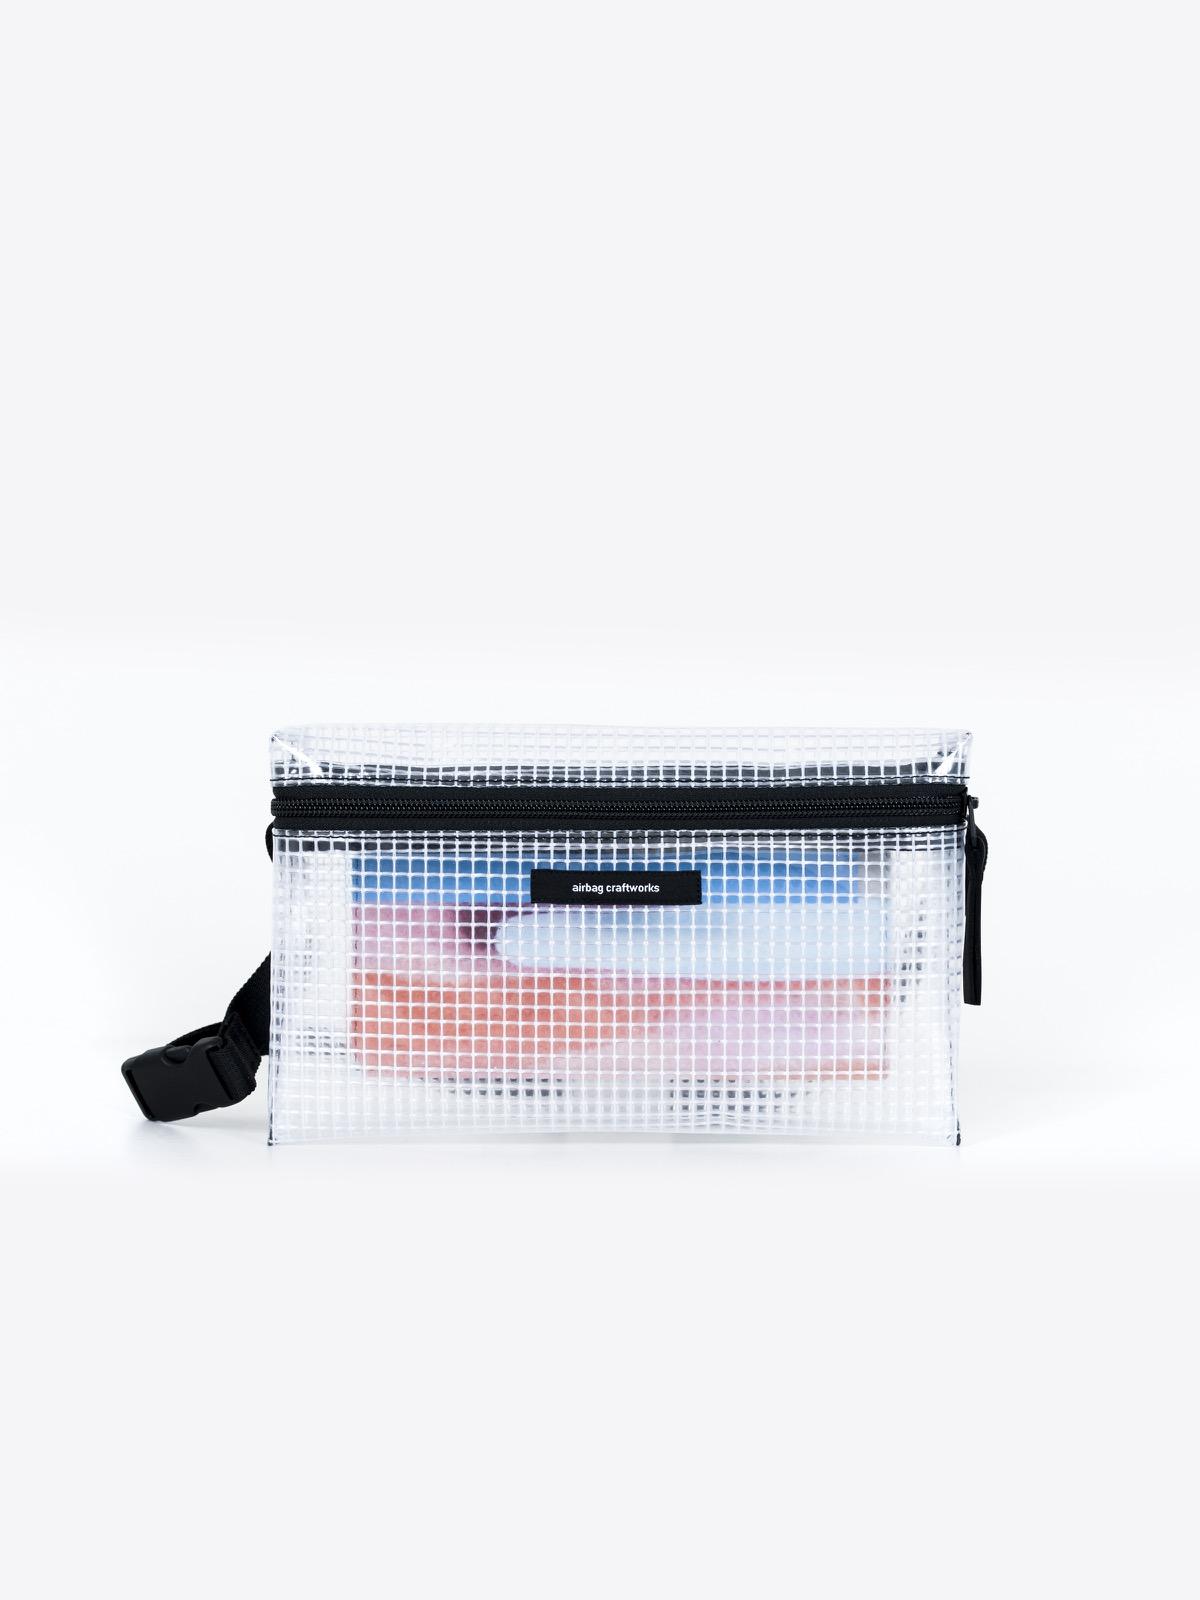 airbag craftworks grid | special edition w/ dennis busch